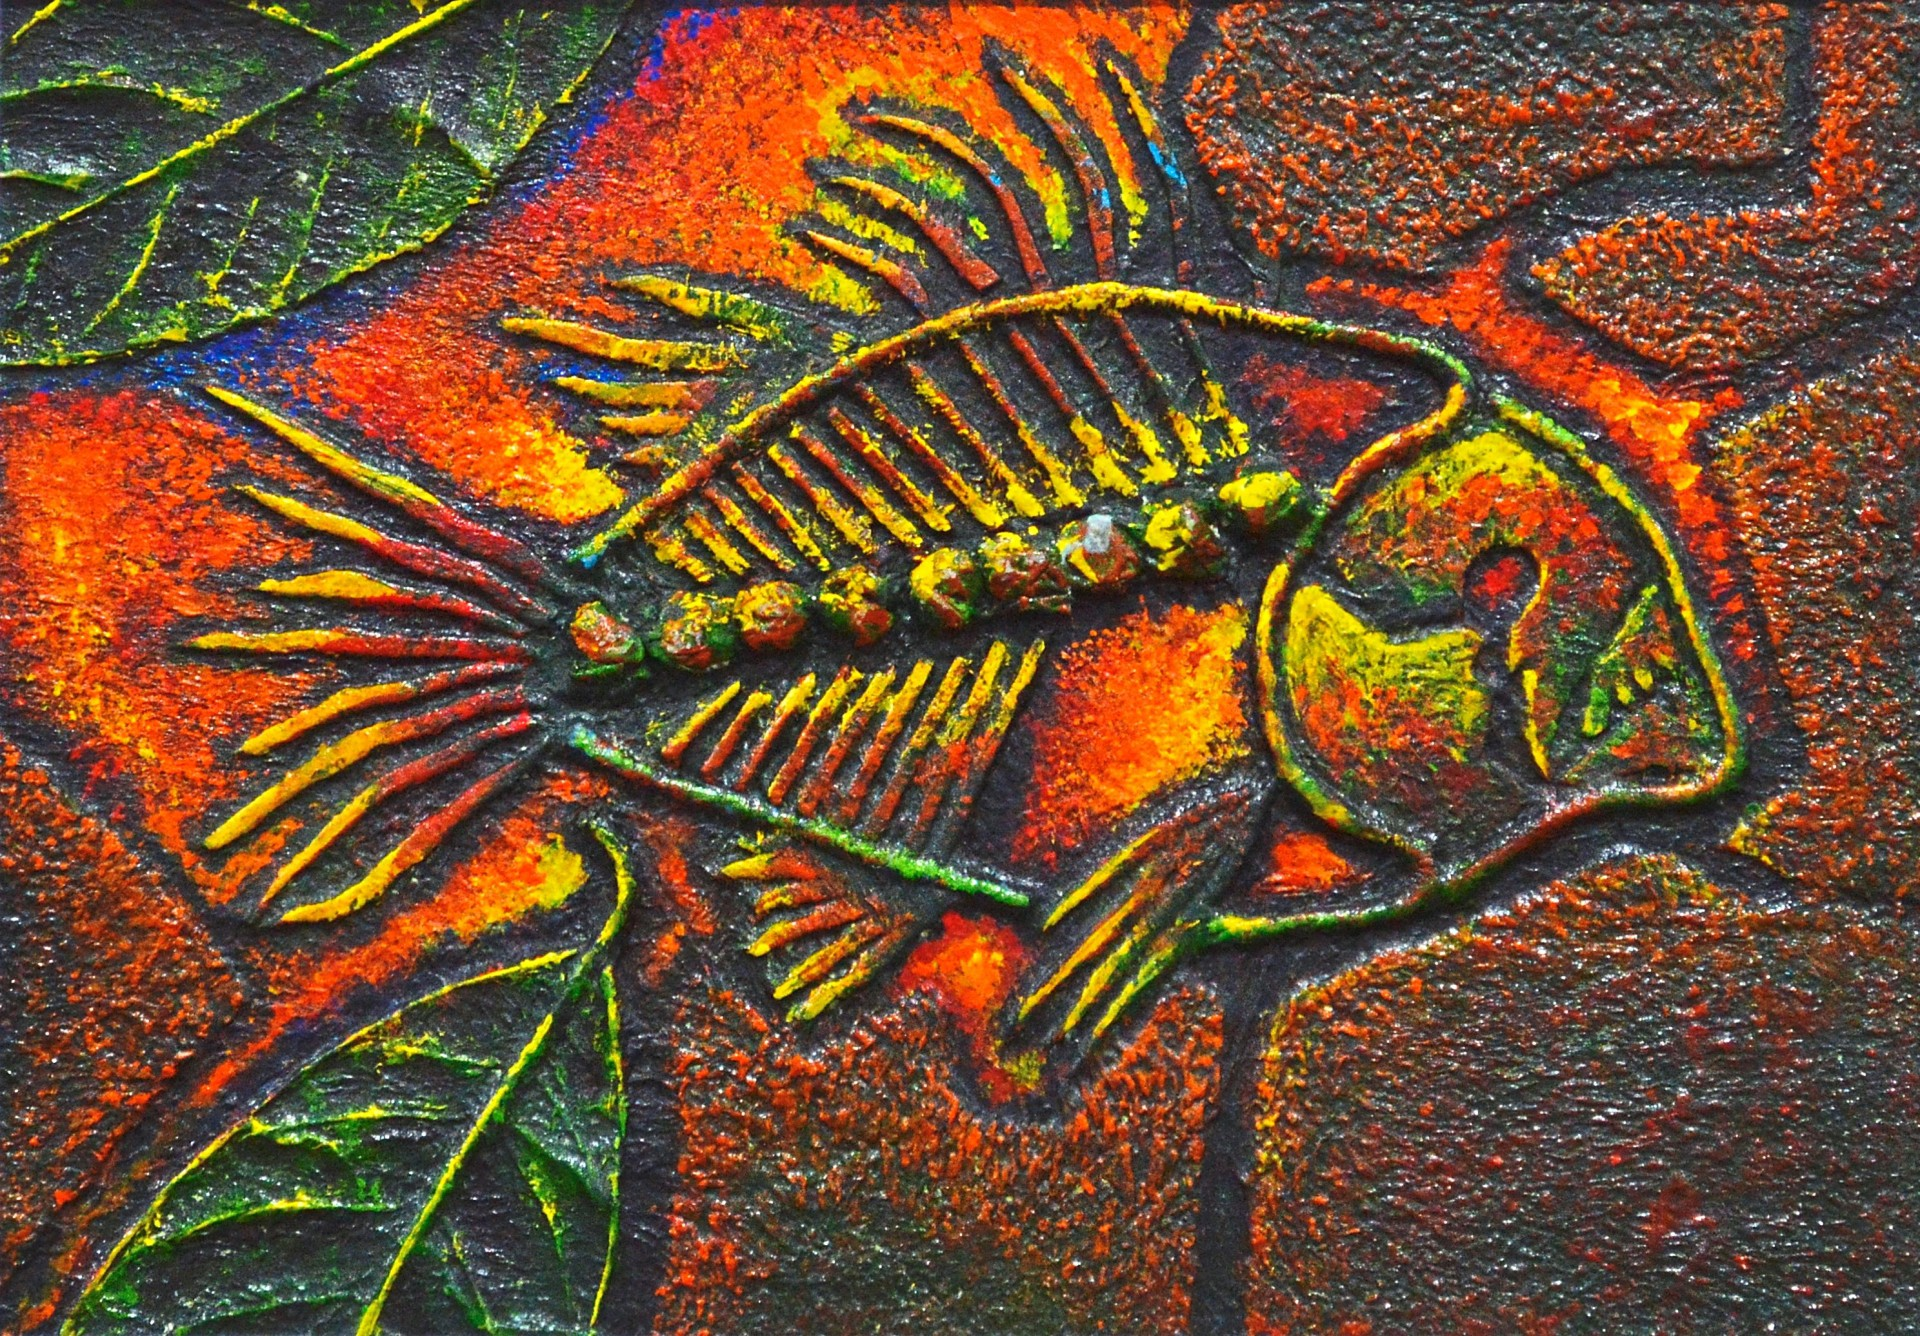 Baba Wong's Fossil: Piranha Series 1 (mixed media, 2019). Photo: TitikMerah Collective